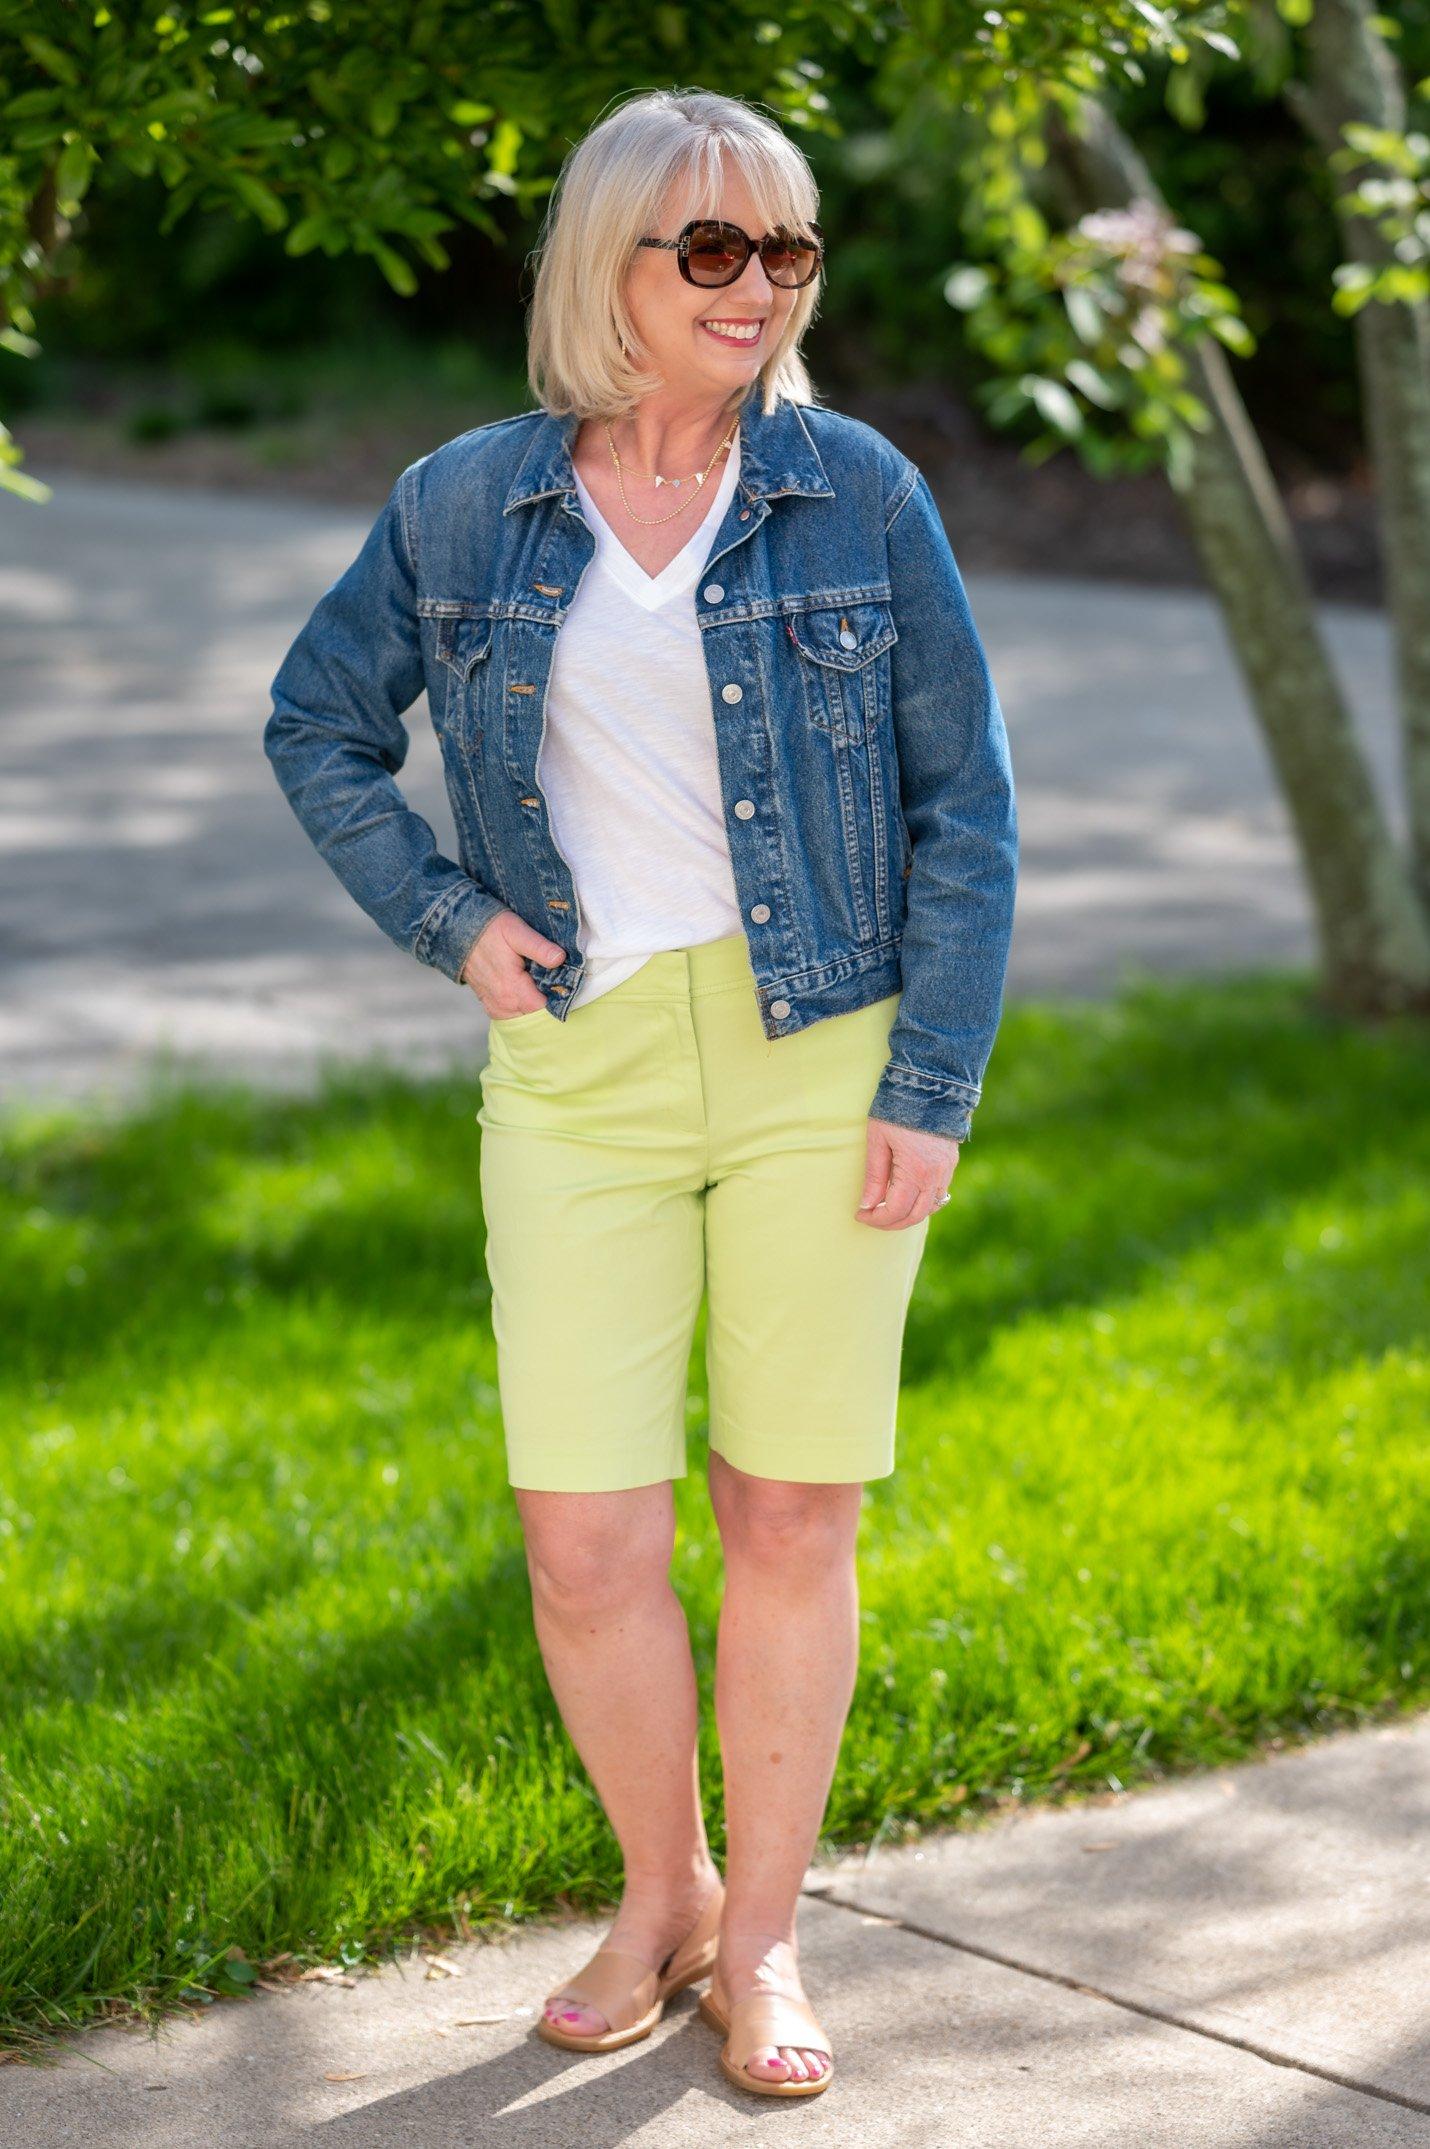 White Tee with Kiwi Green Shorts and Denim Jacket